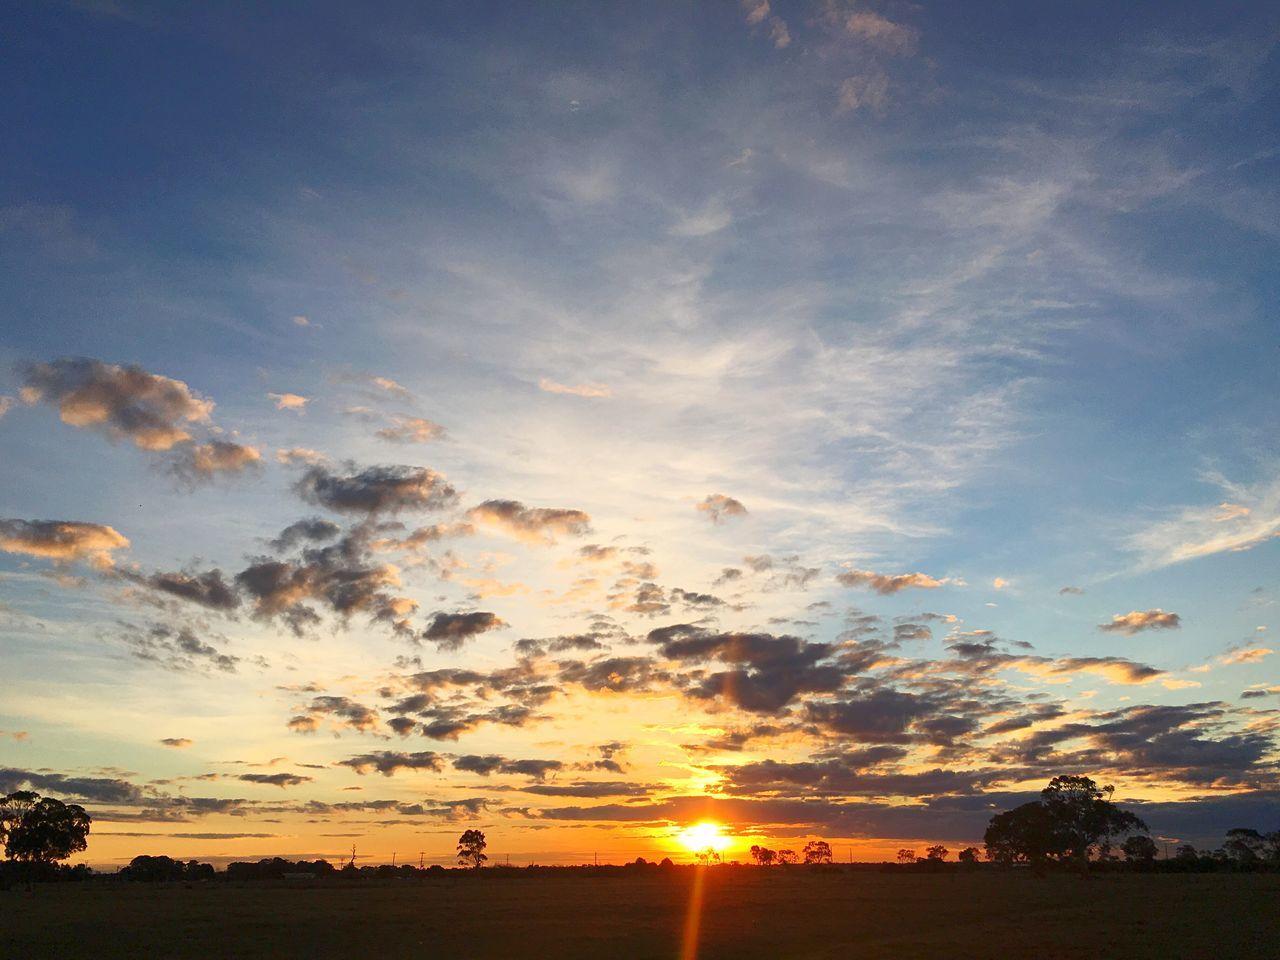 Sunset_collection Sunset #sun #clouds #skylovers #sky #nature #beautifulinnature #naturalbeauty #photography #landscape EyeEm Best Shots Fantastic View